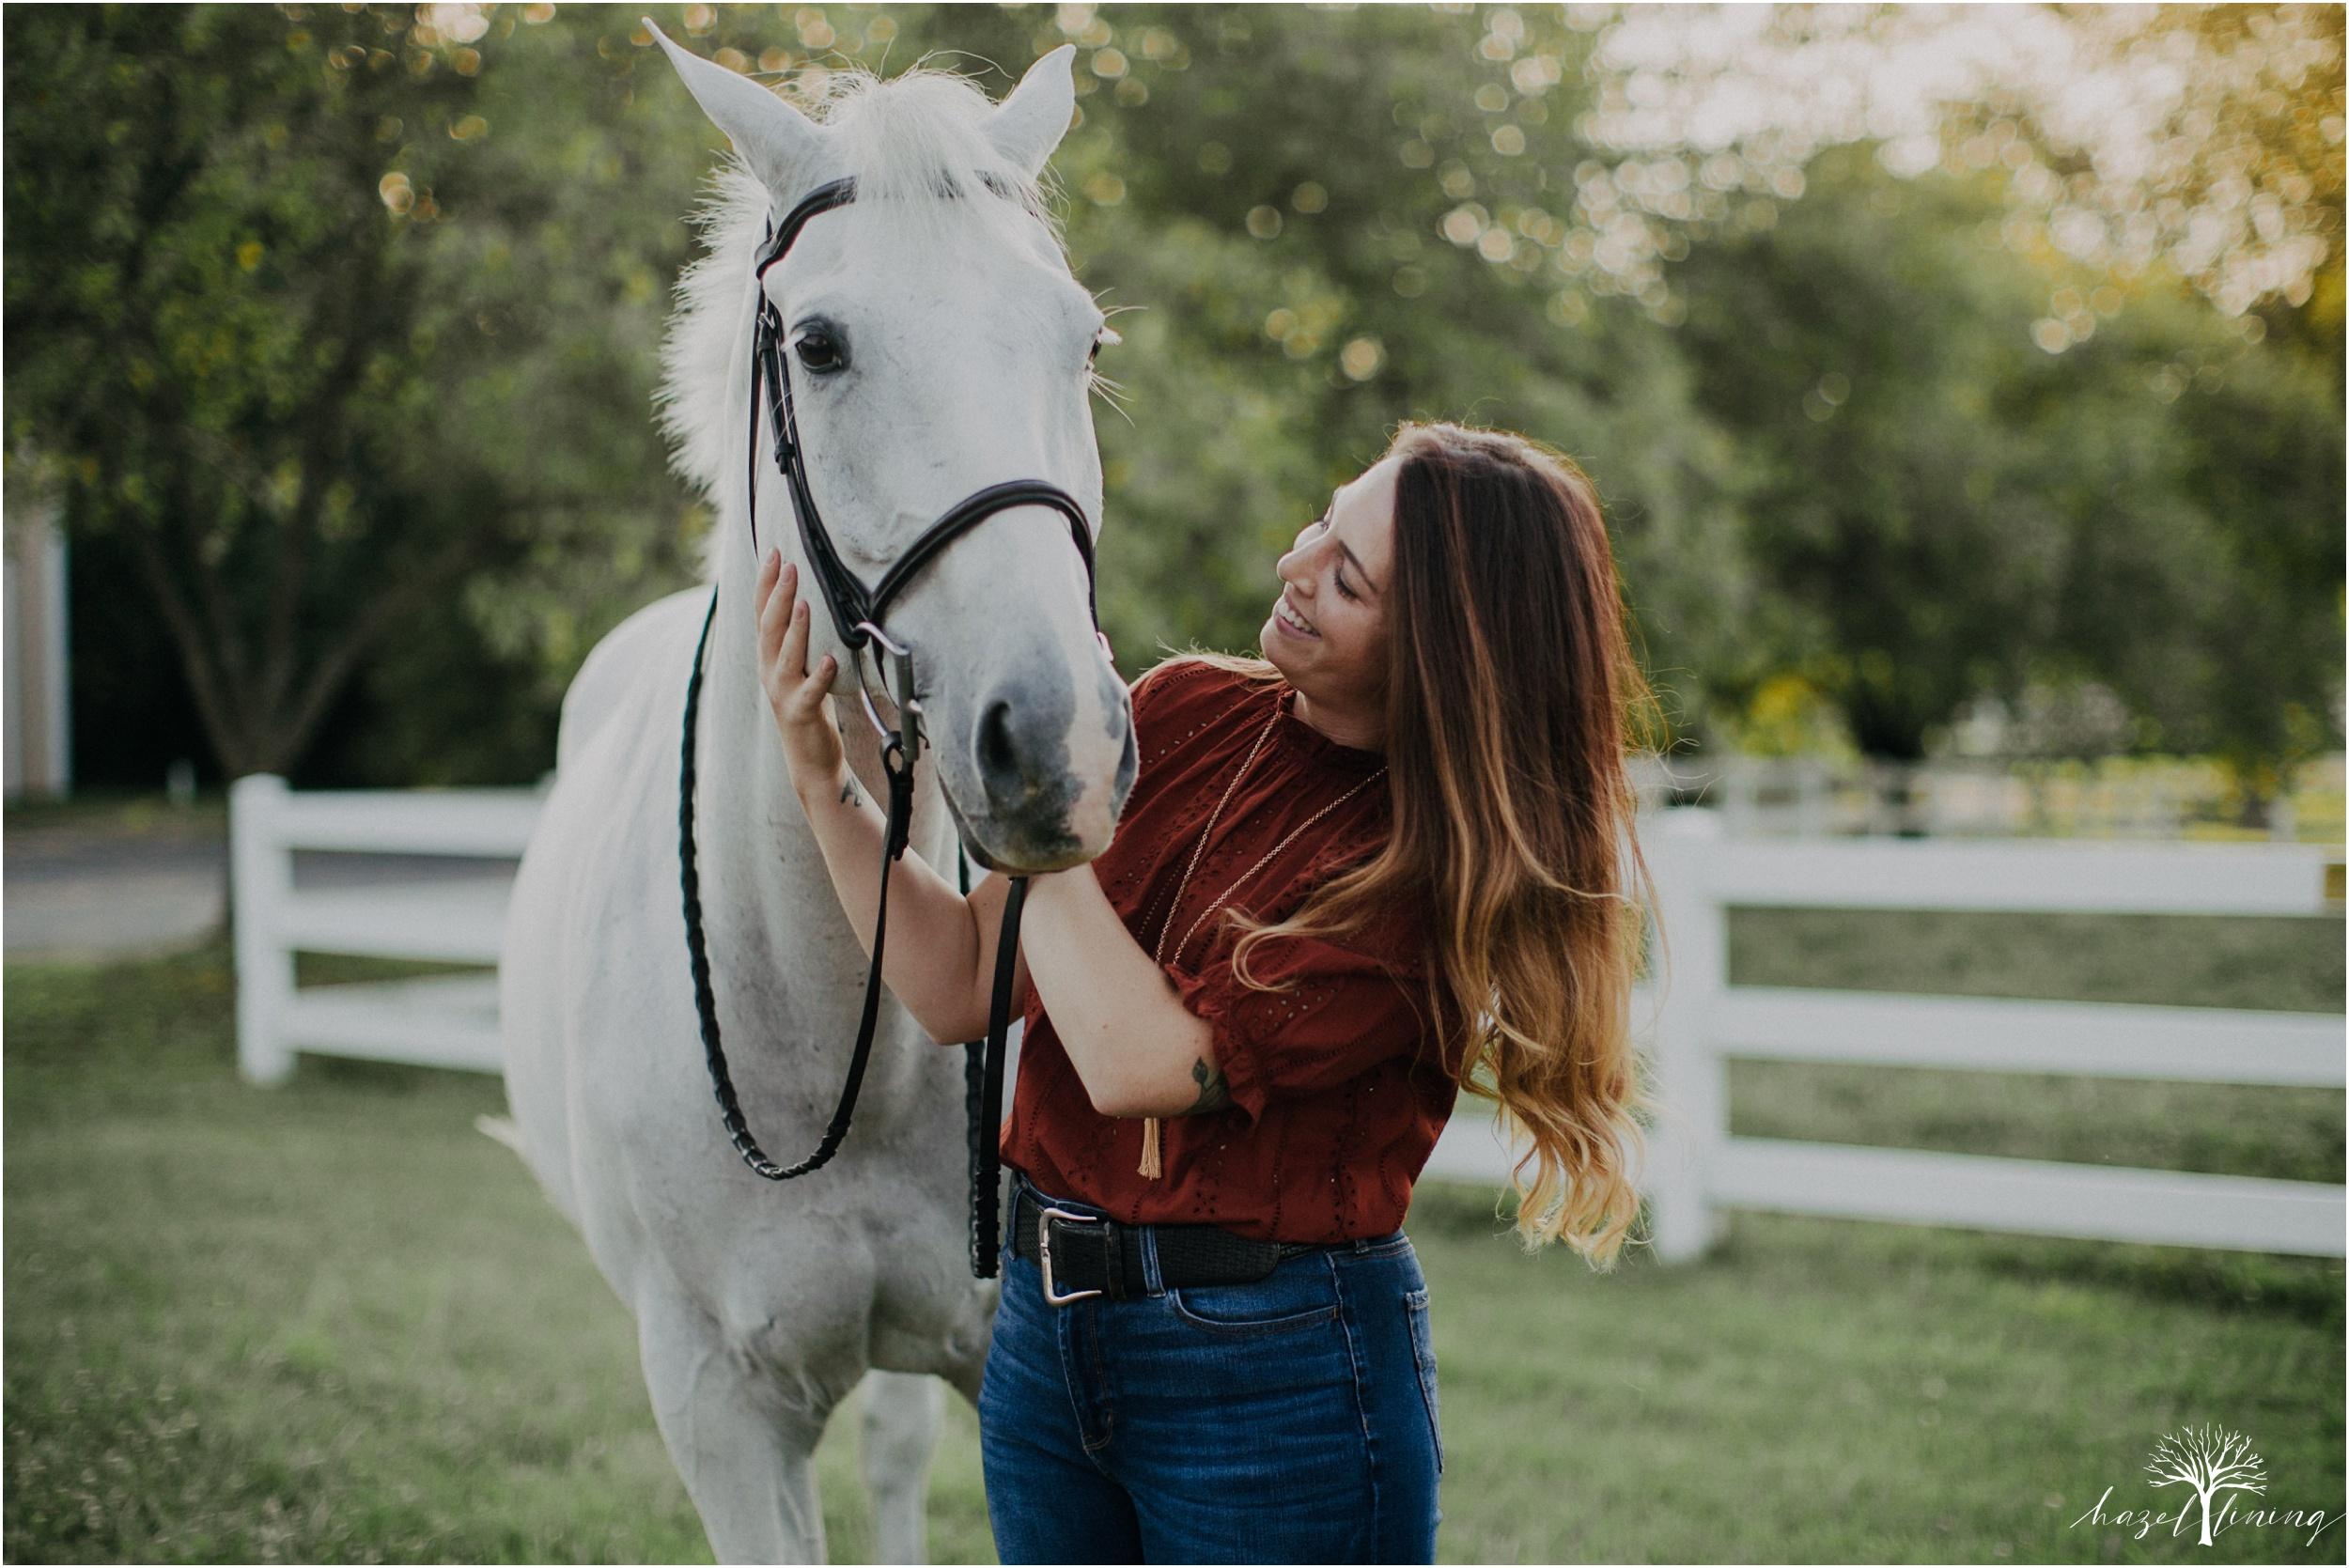 taylor-adams-and-horse-delaware-valley-university-delval-summer-equestrian-portrait-session-hazel-lining-photography-destination-elopement-wedding-engagement-photography_0008.jpg